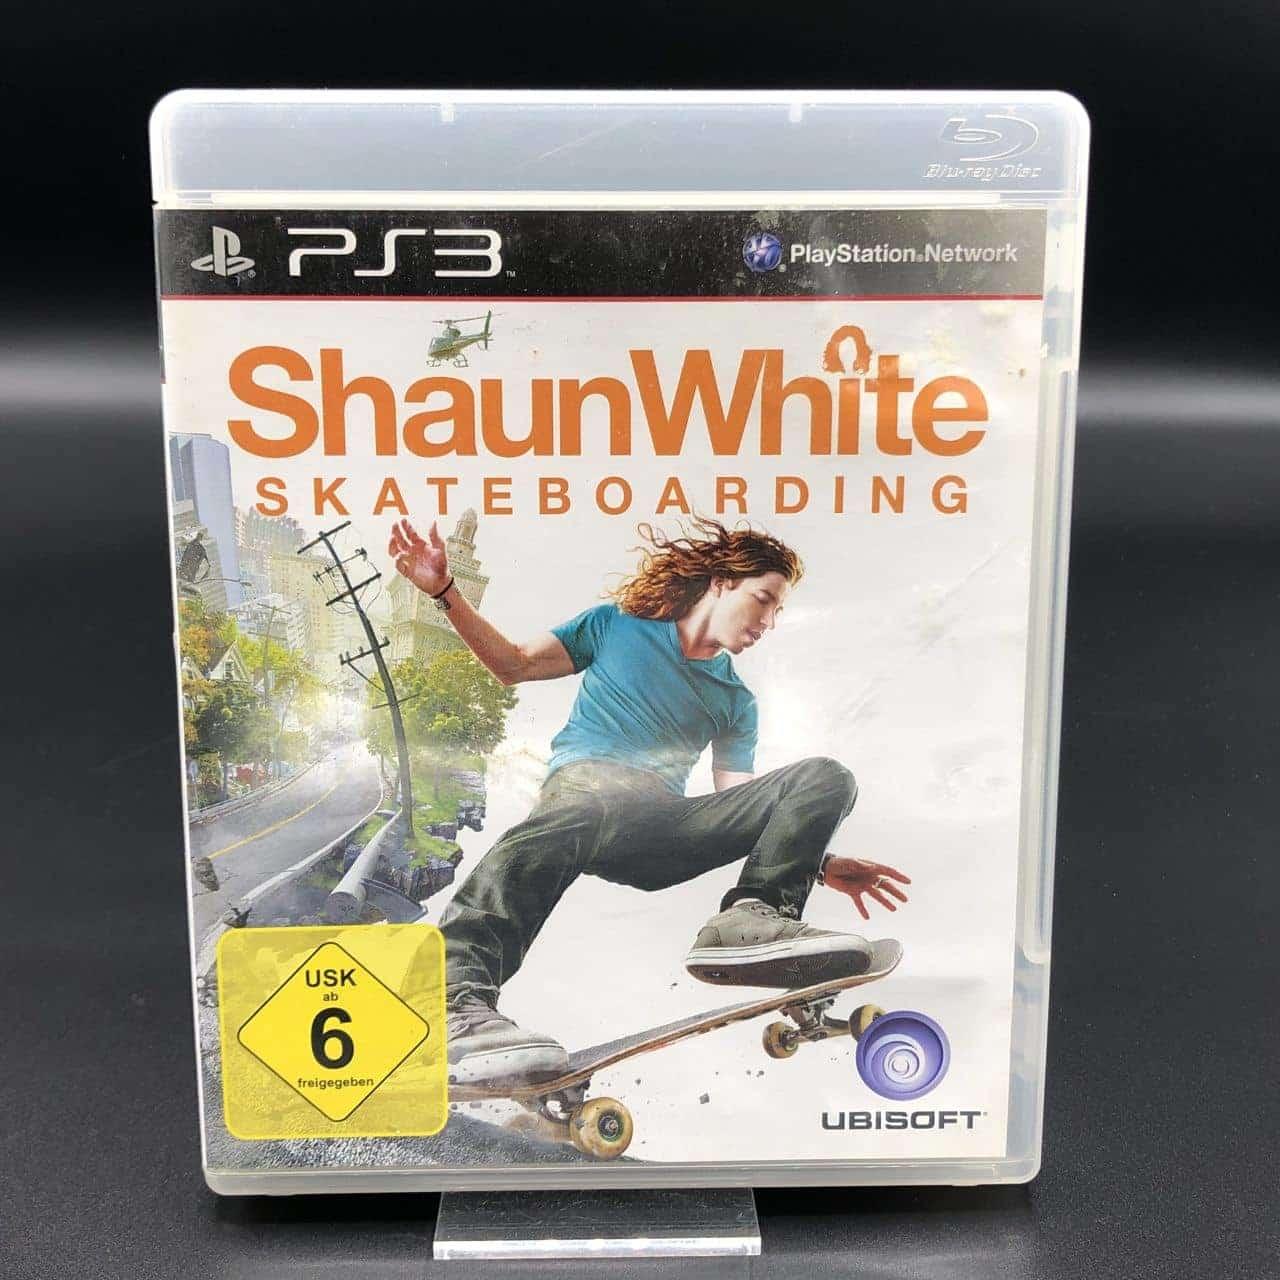 PS3 Shaun White Skateboarding (Komplett) (Sehr gut) Sony PlayStation 3